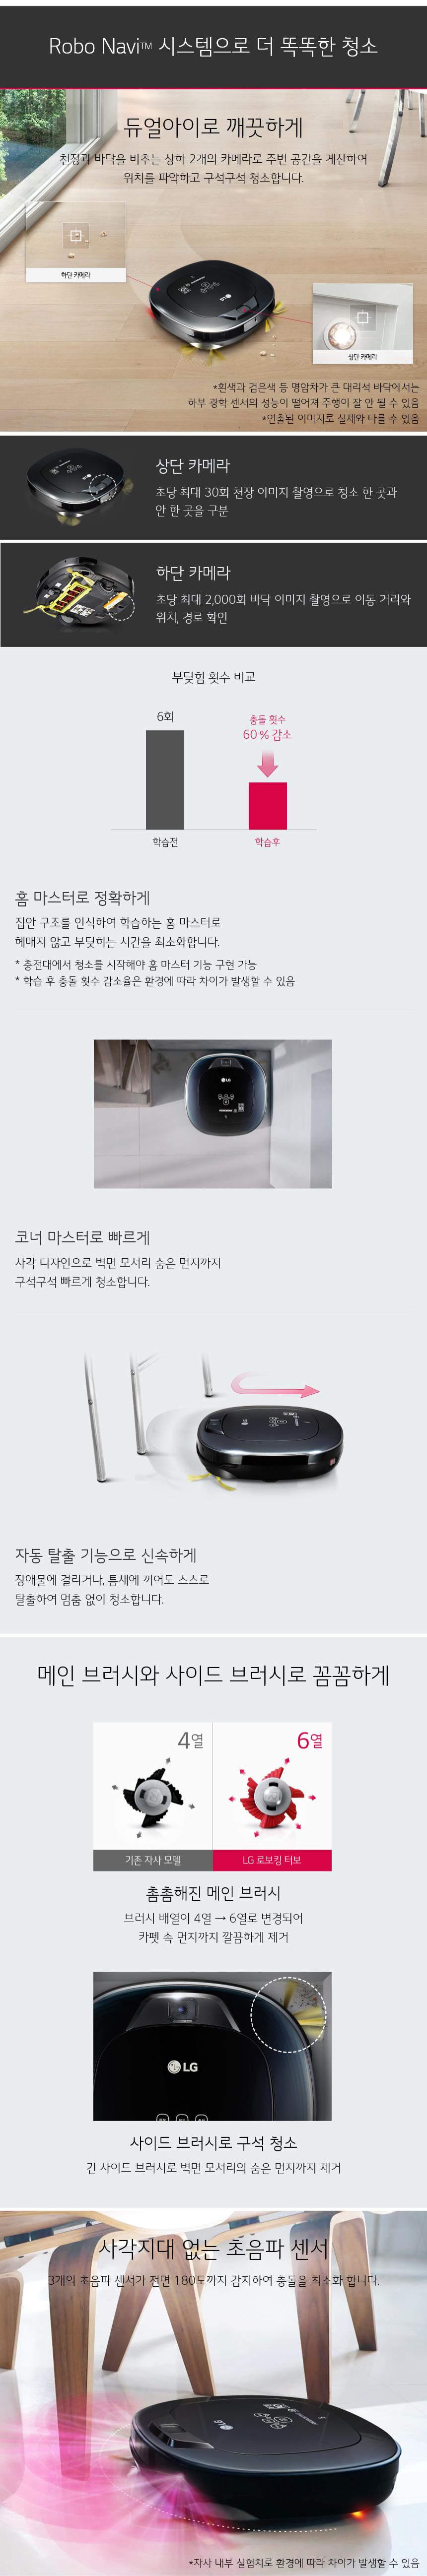 Robo Navi™ 시스템으로 똑똑한 청소